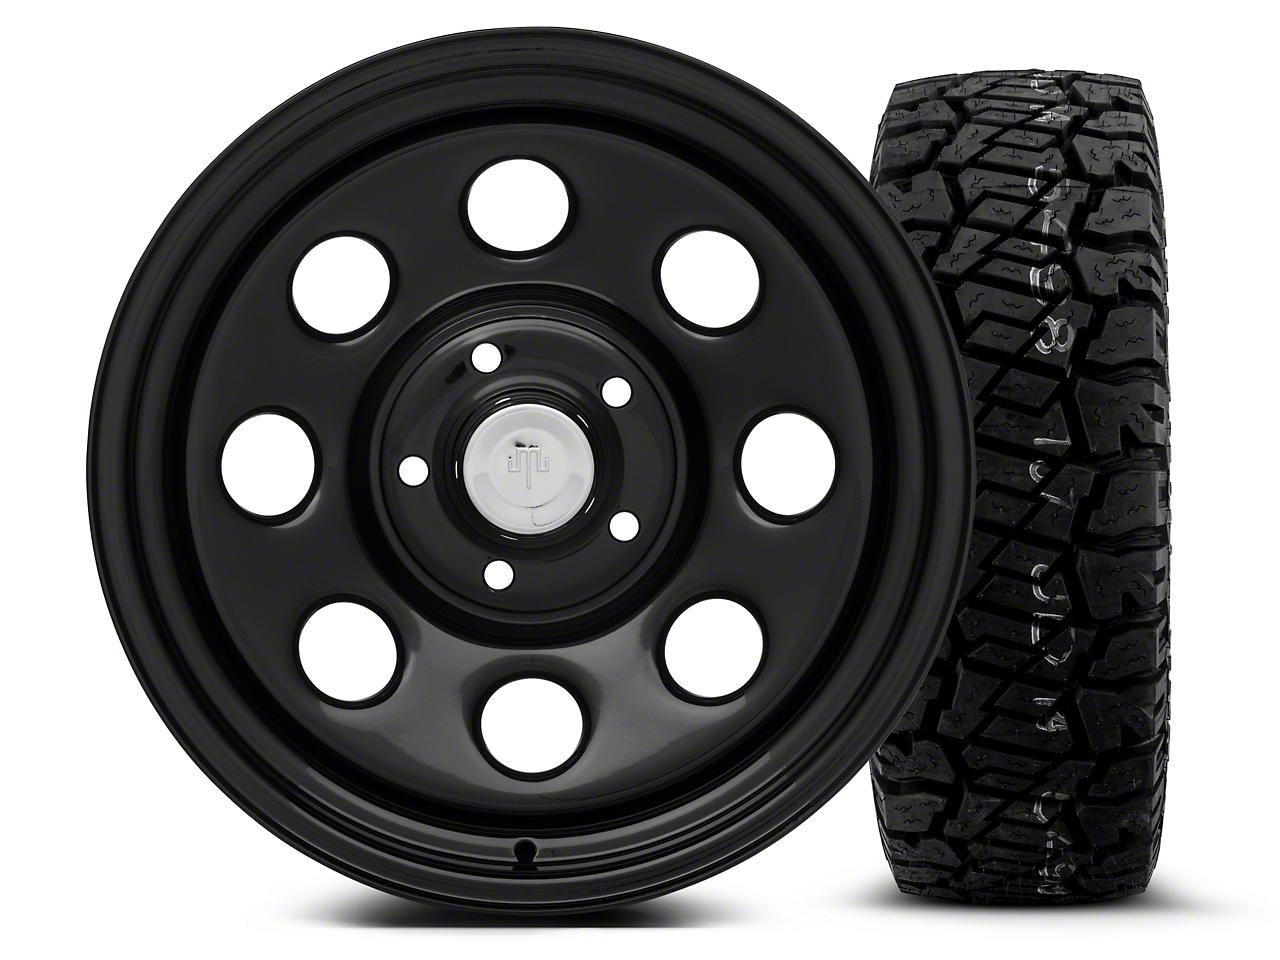 Mammoth 8 Black Steel - 17x9 Wheel - and Dick Cepek Fun Country Tire - 285/70R17 (07-18 Jeep Wrangler JK; 2018 Jeep Wrangler JL)